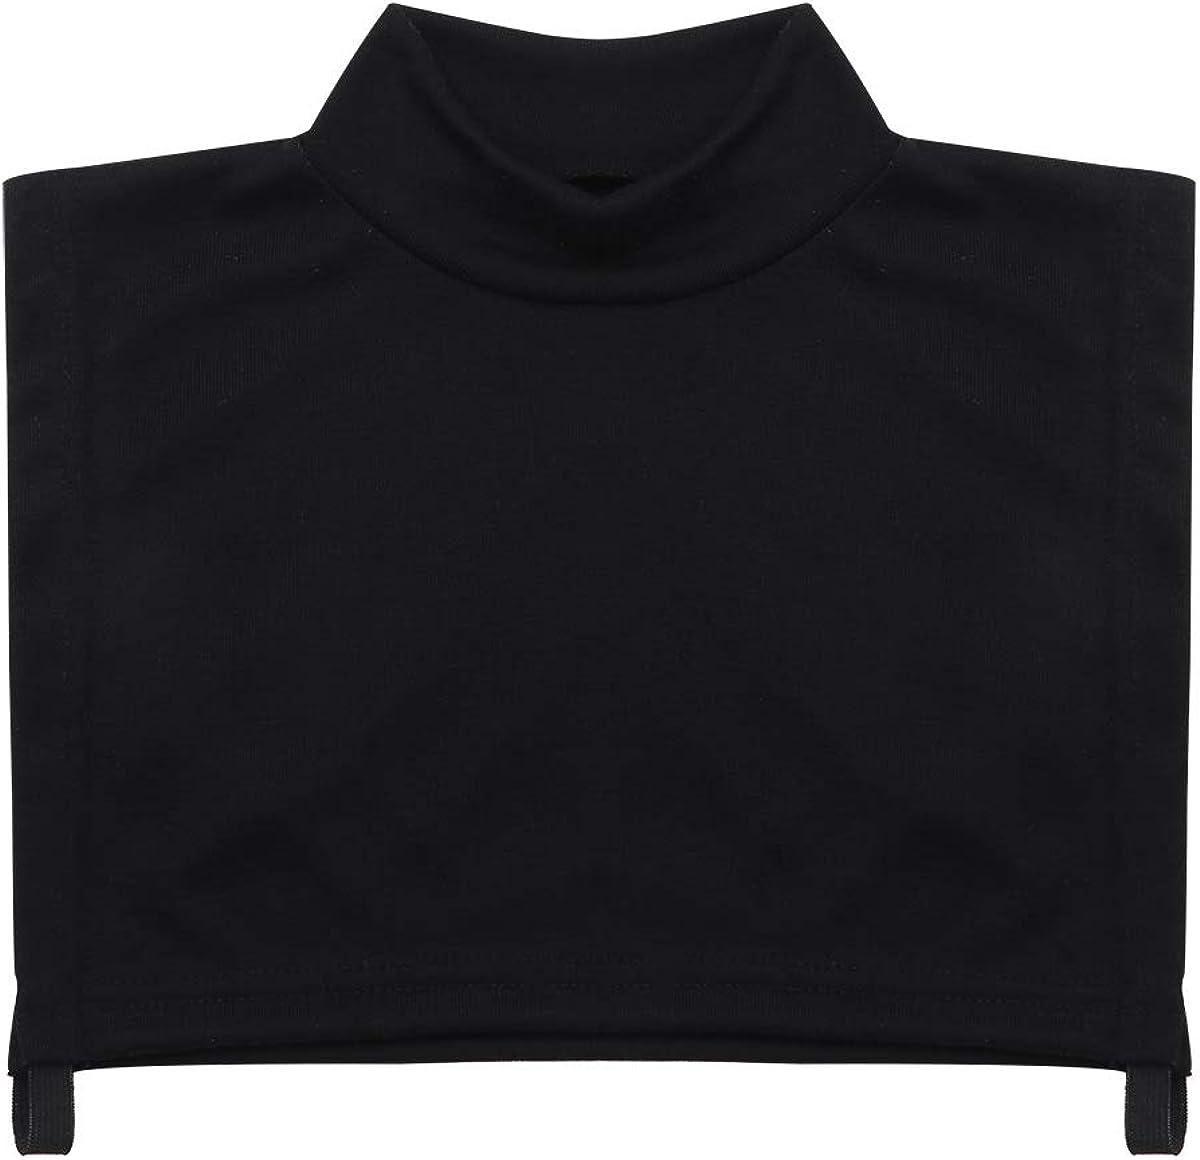 IEFIEL Womens Fake Collar Detachable Turtleneck Top Half Blouse Dickey Collar Neck Cover